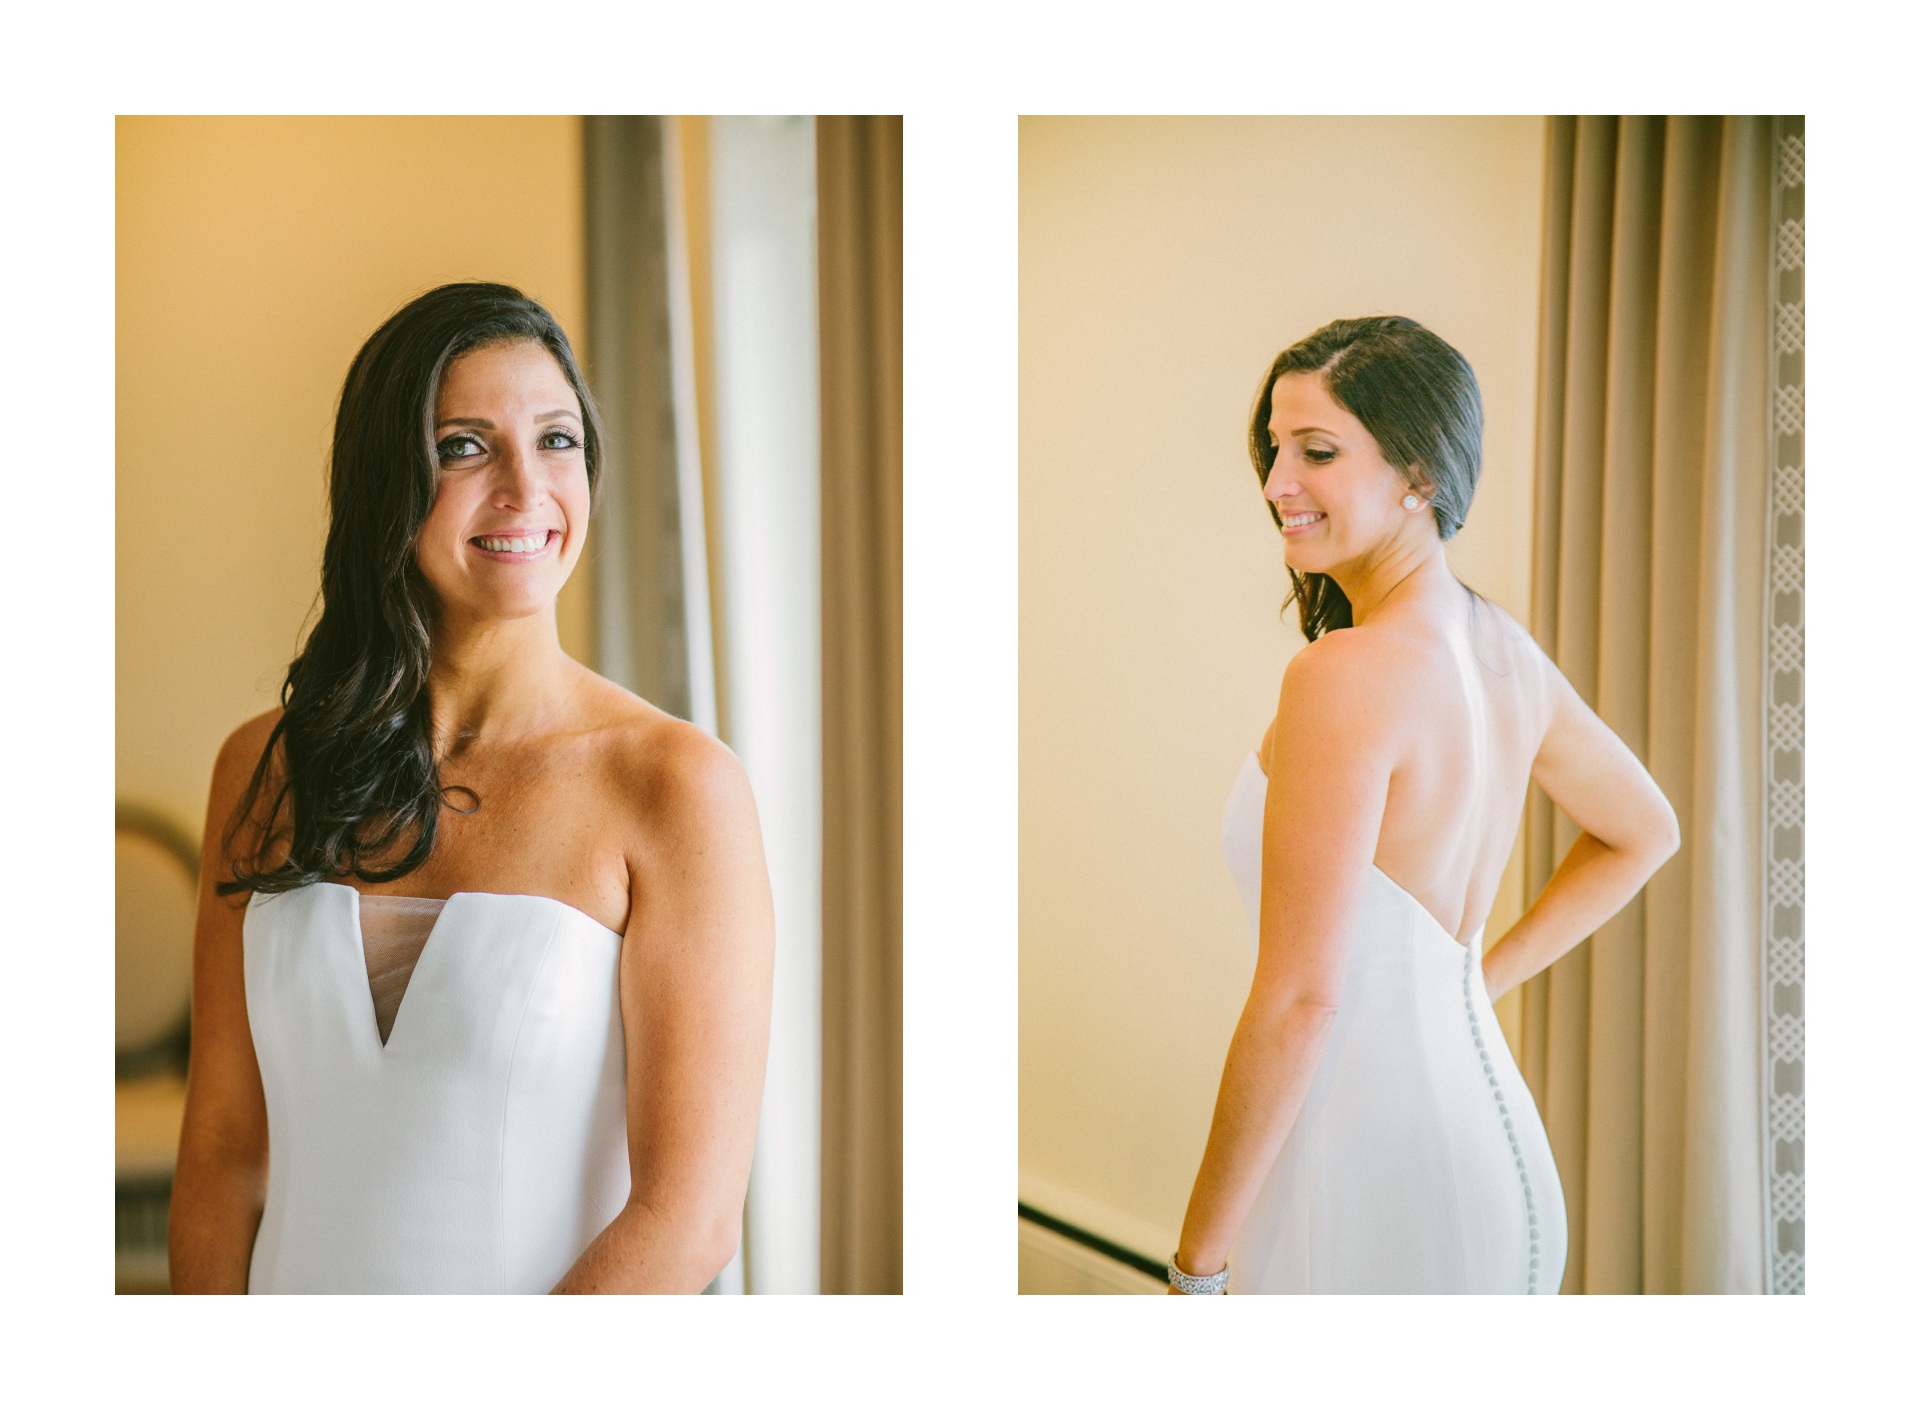 Beechmont Country Club Wedding Photographer in Beachwood 1 20.jpg